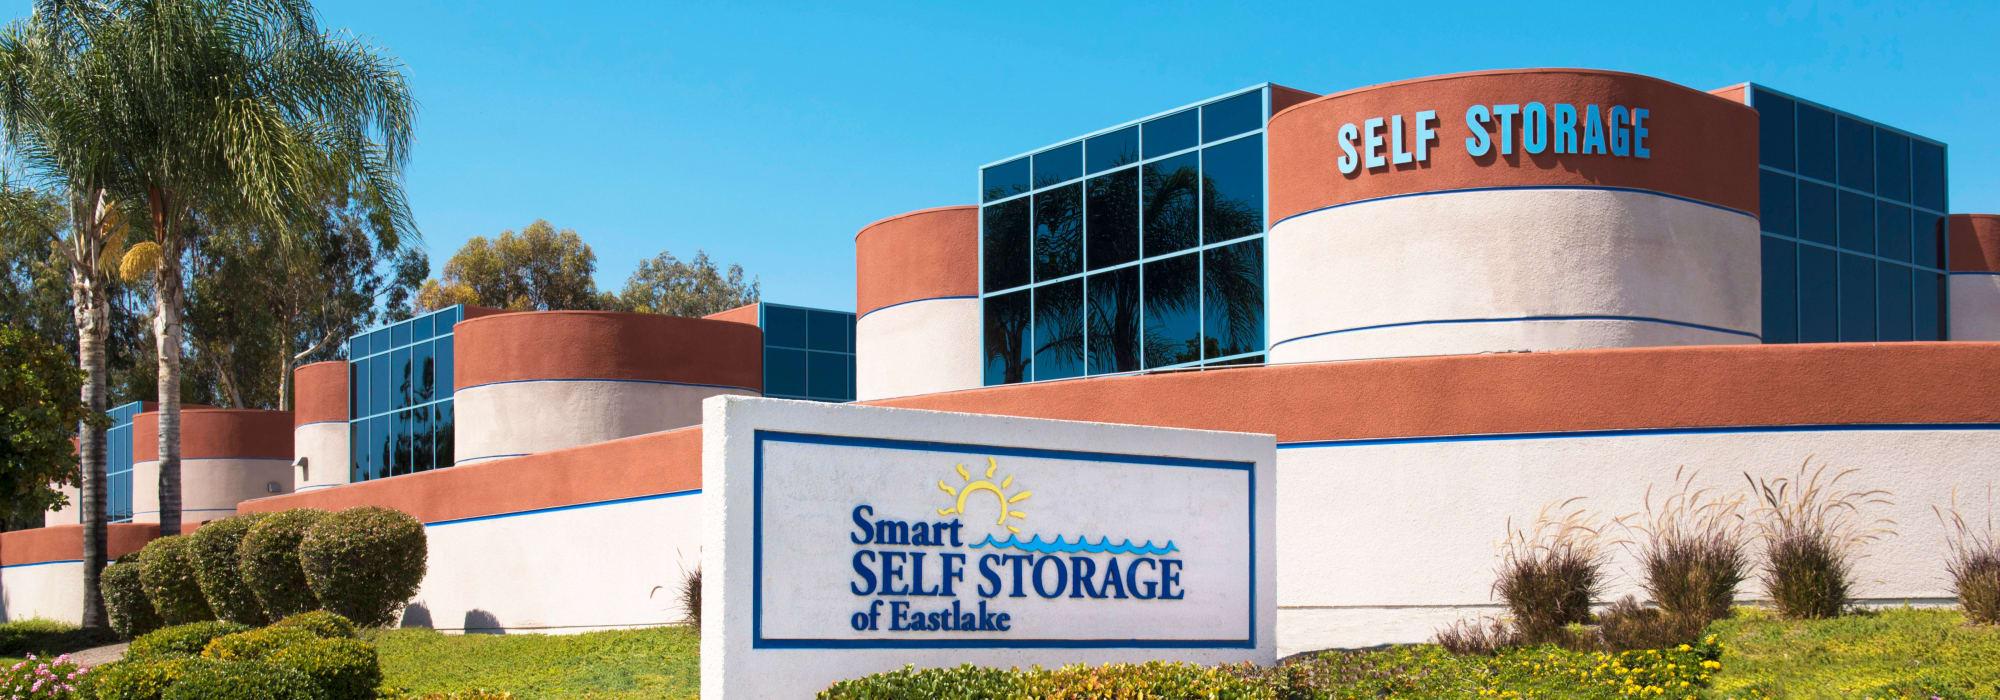 Branding on the exterior of Smart Self Storage of Eastlake in Chula Vista, California